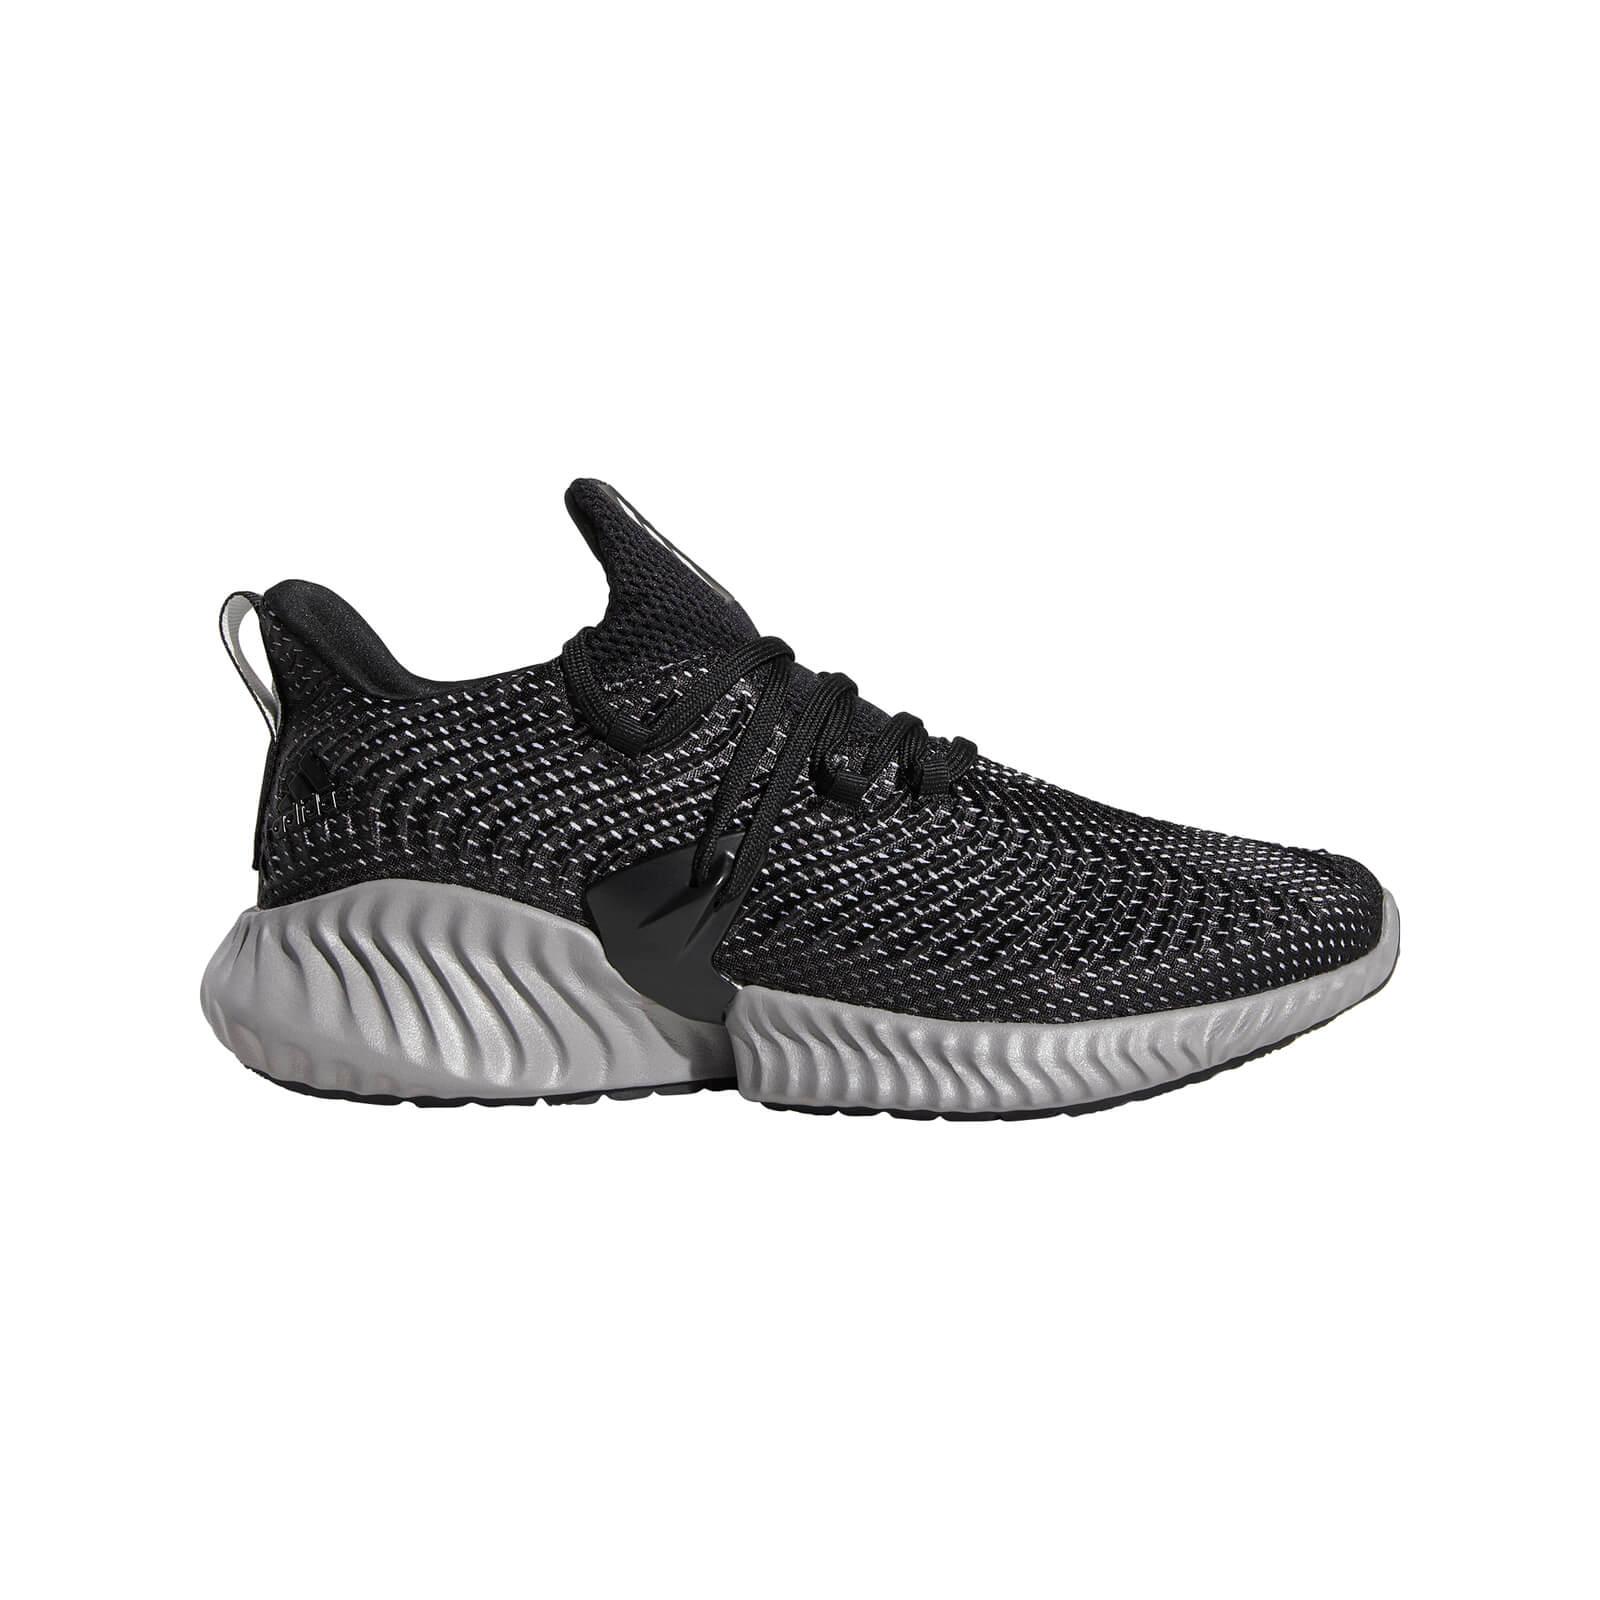 adidas Men's Alphabounce Instinct Running Shoes - Black - US 8/UK 7.5 - Black